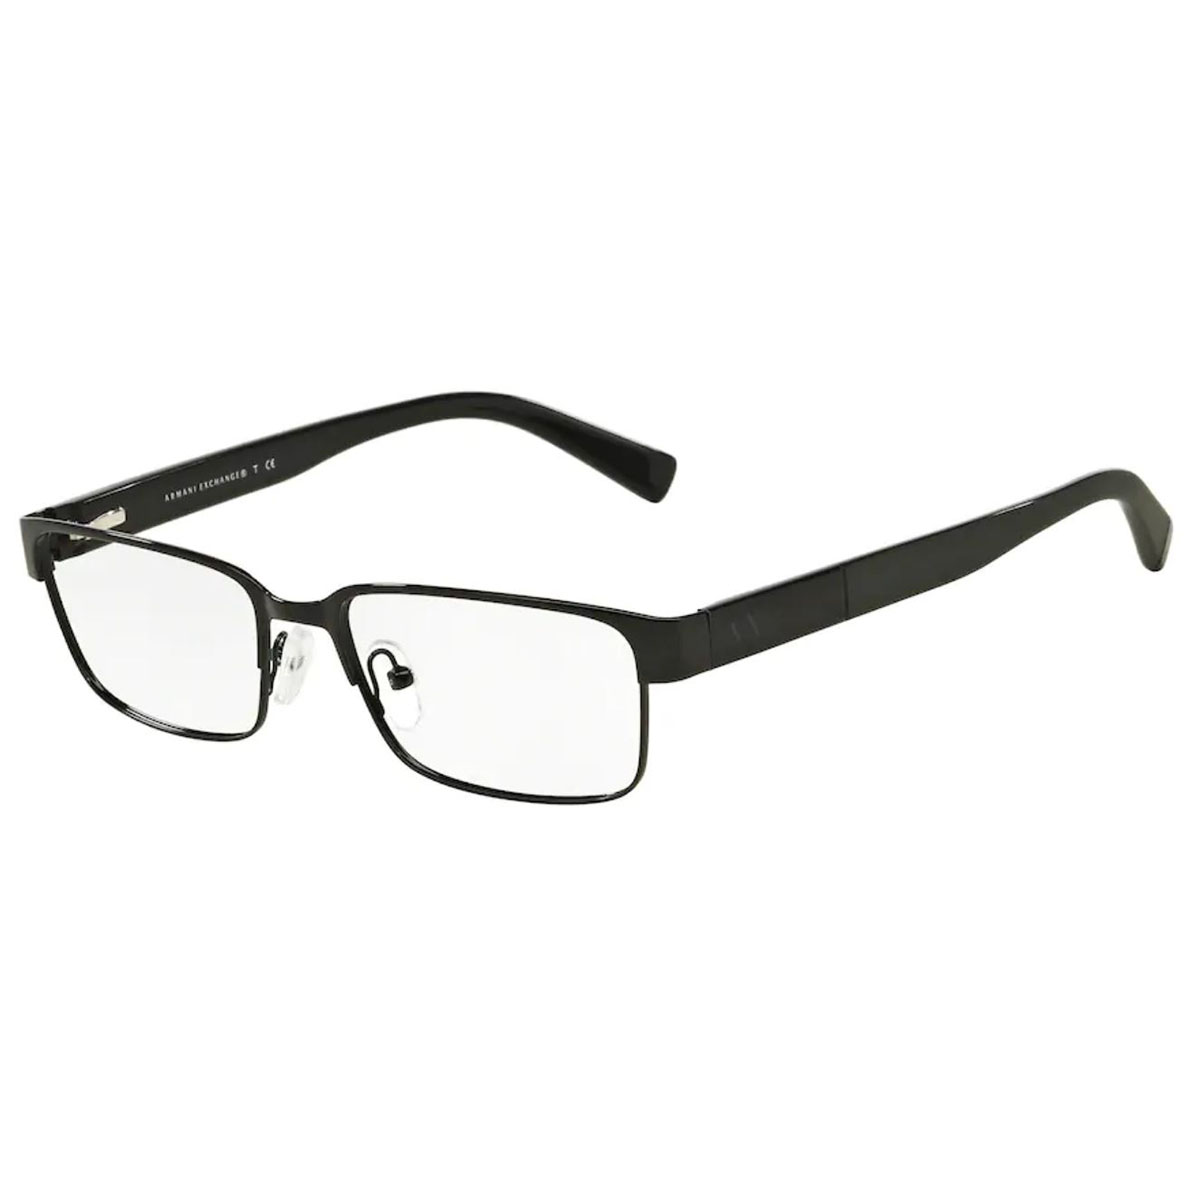 Óculos de Grau Masculino Armani Exchange AX1017L Preto Brilho